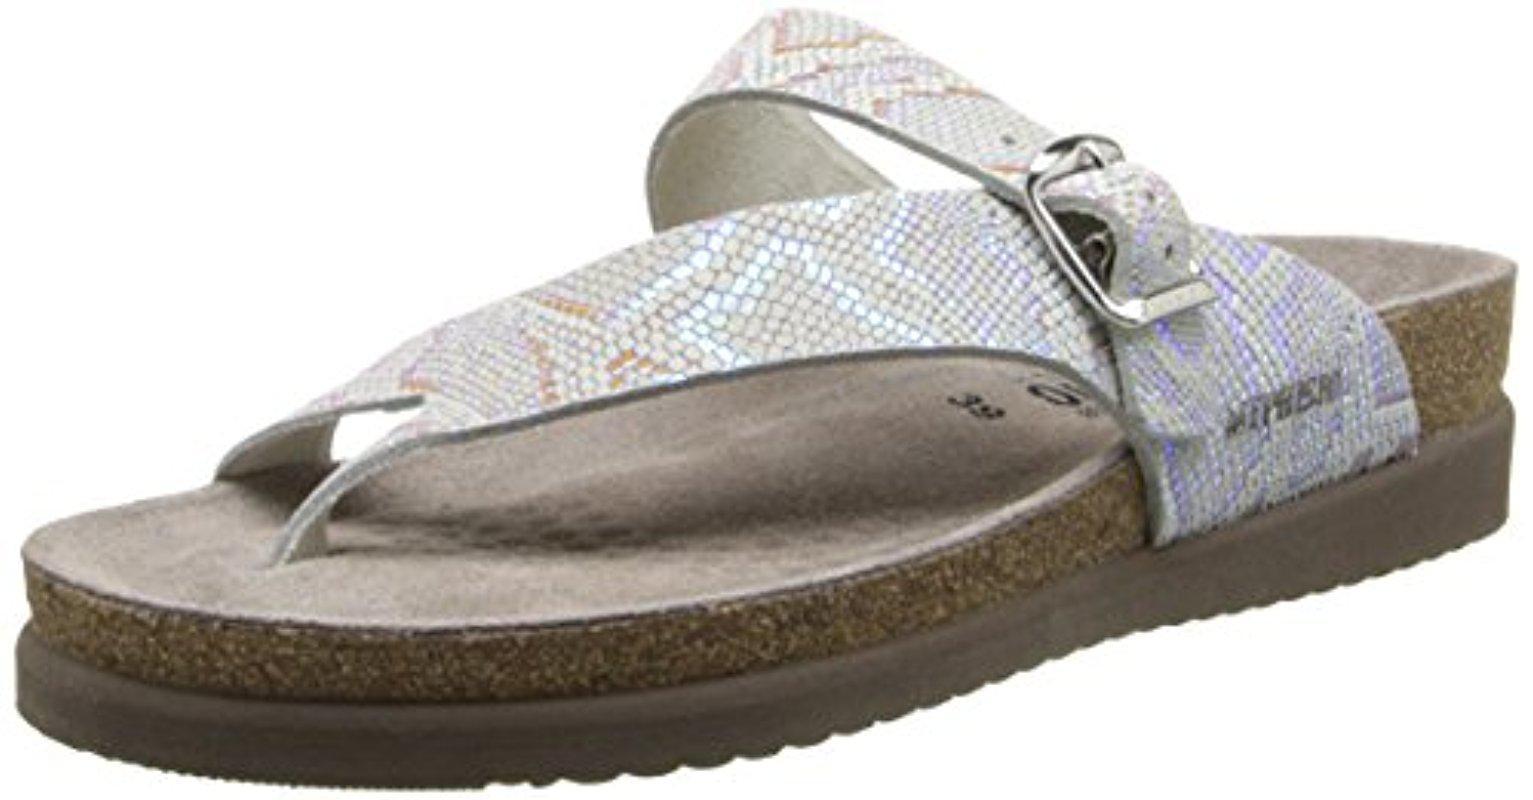 Mephisto. Women's Metallic Helen Thong Sandals